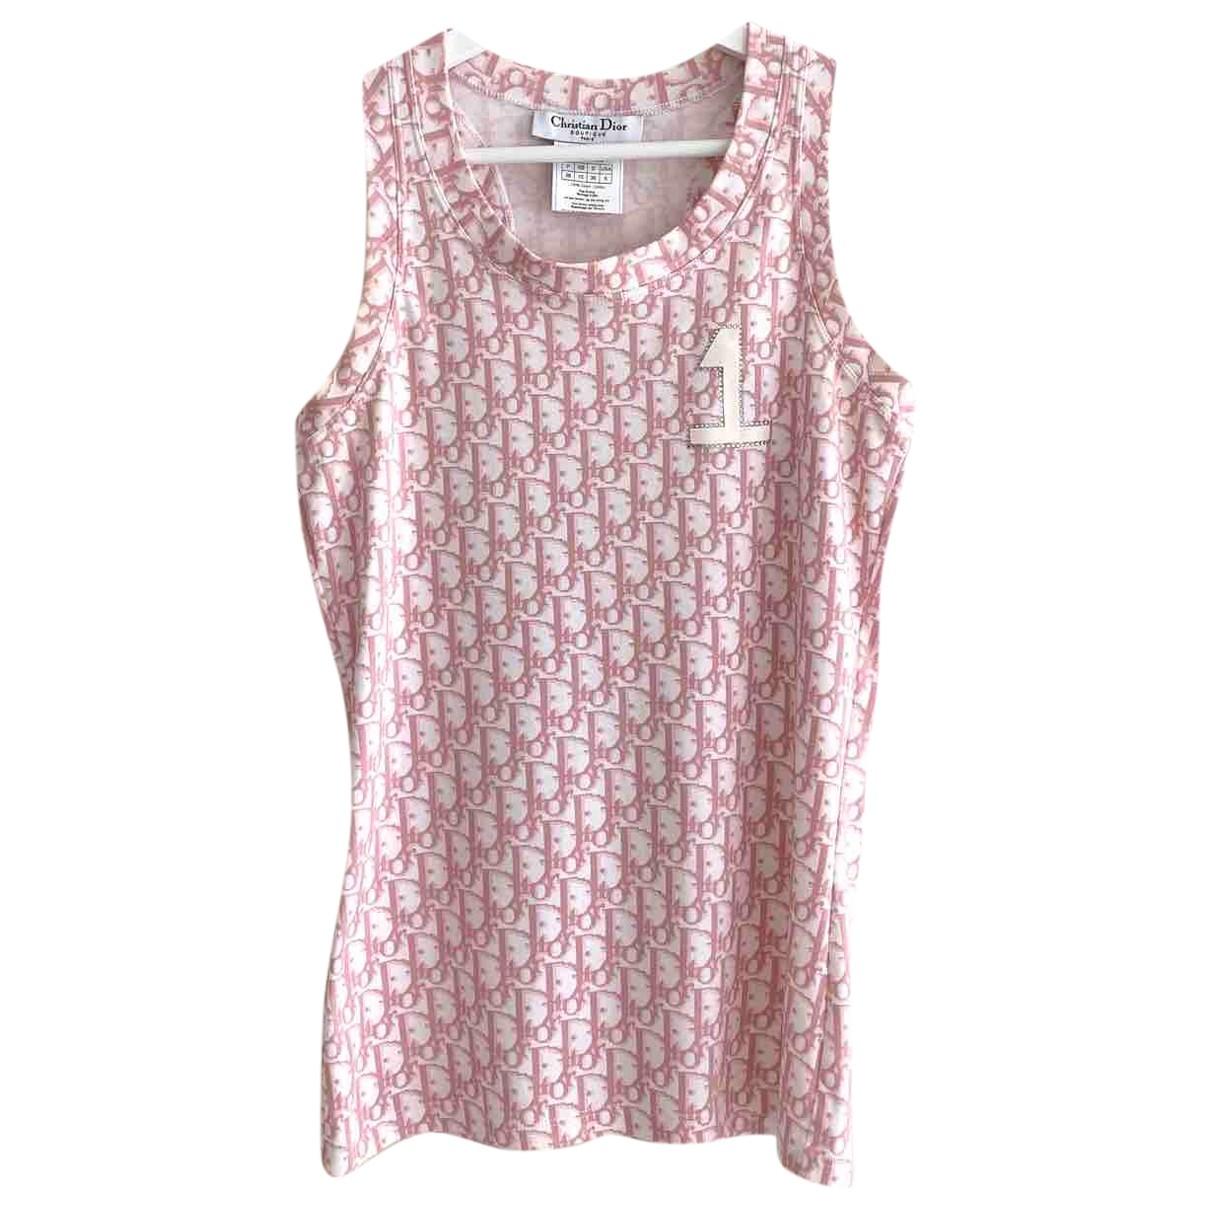 Camiseta sin mangas Christian Dior